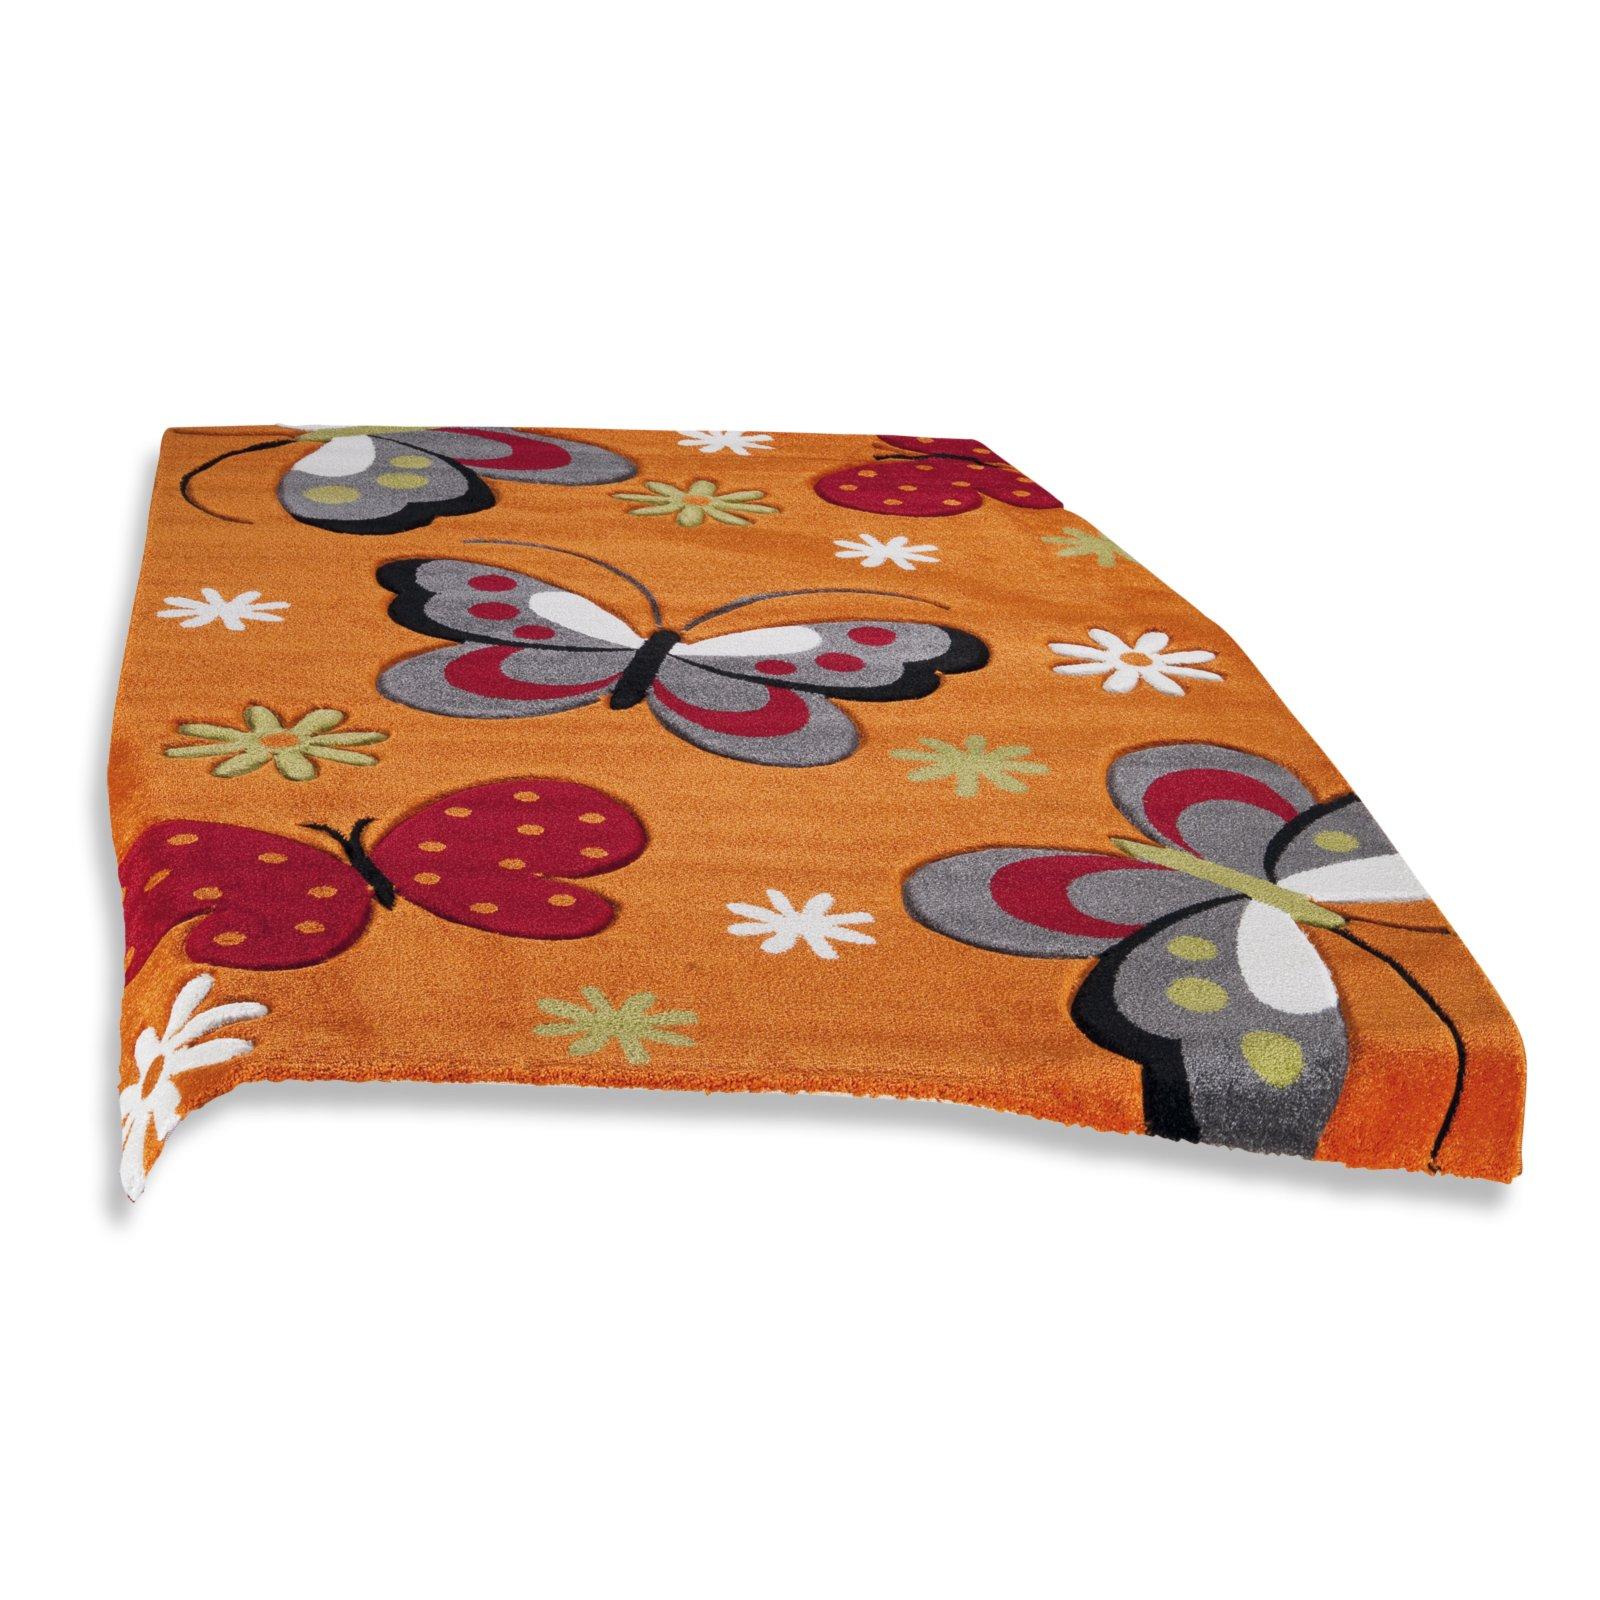 teppich modern diamond orange schmetterlinge 80x150 cm gemusterte teppiche teppiche. Black Bedroom Furniture Sets. Home Design Ideas